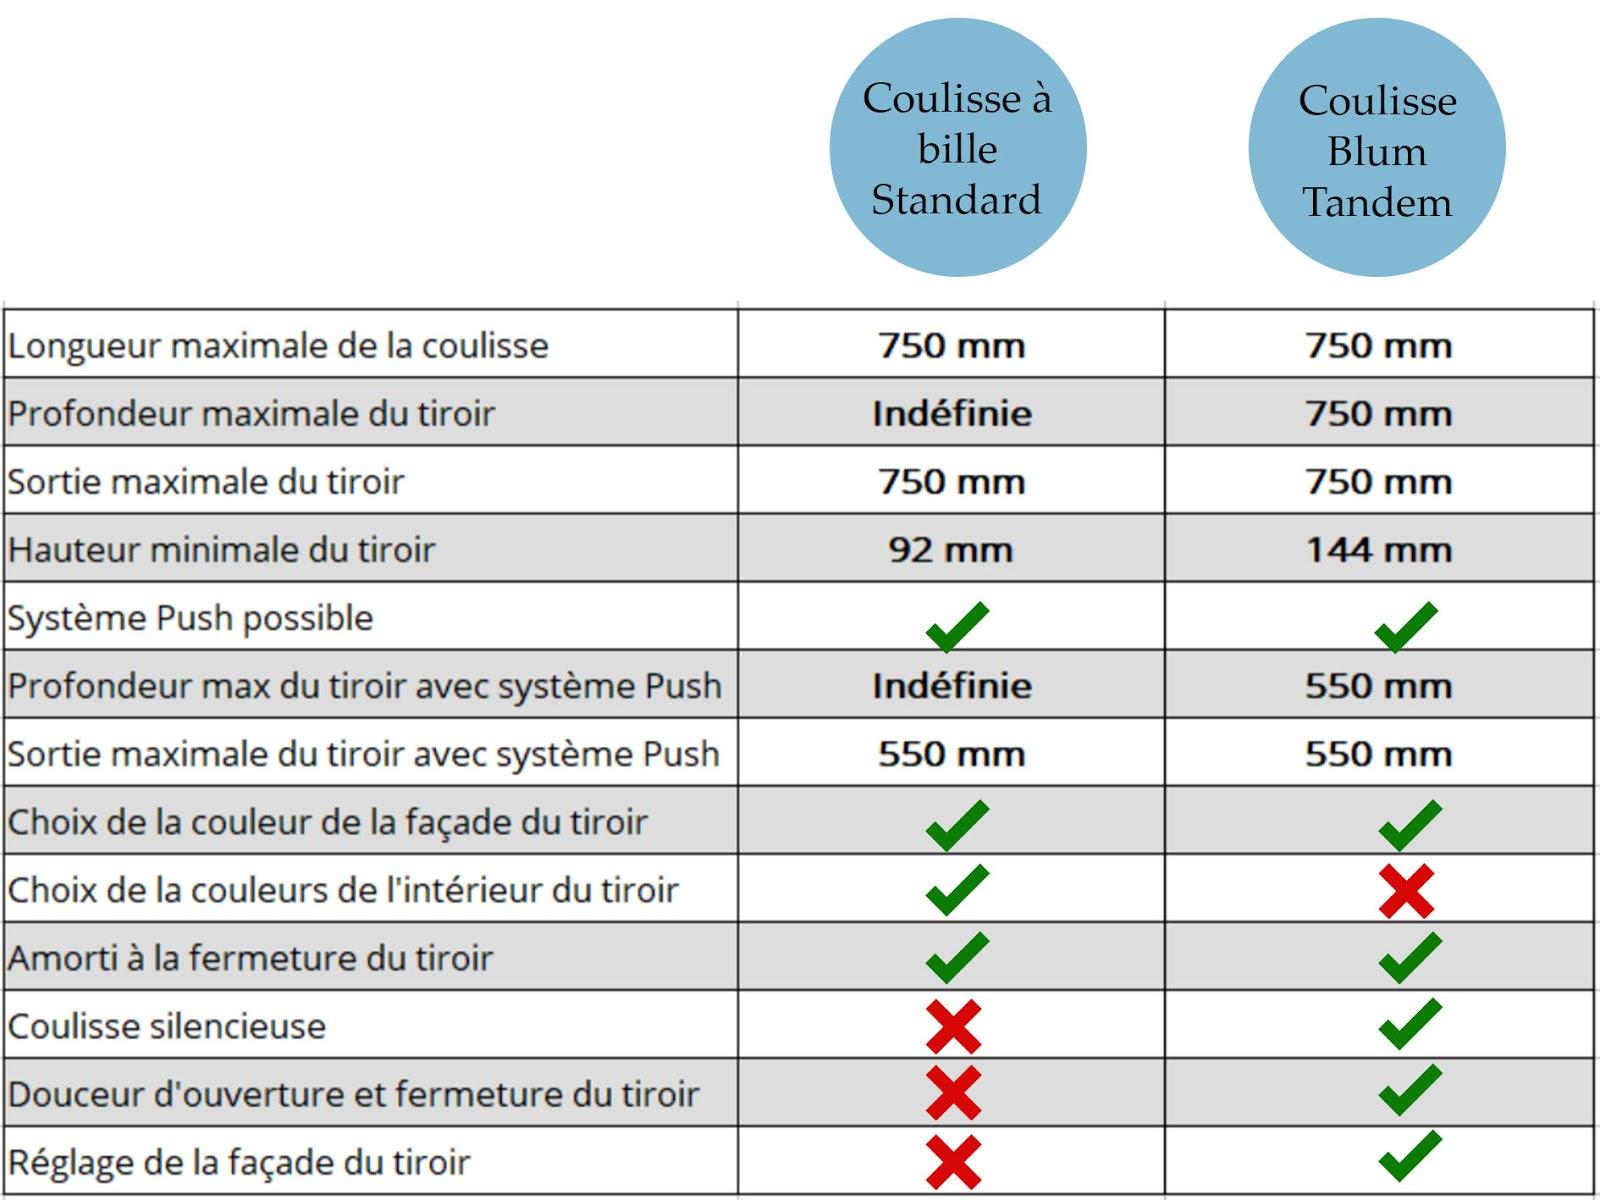 tableau-comparatif coulisse standard tandem-blum